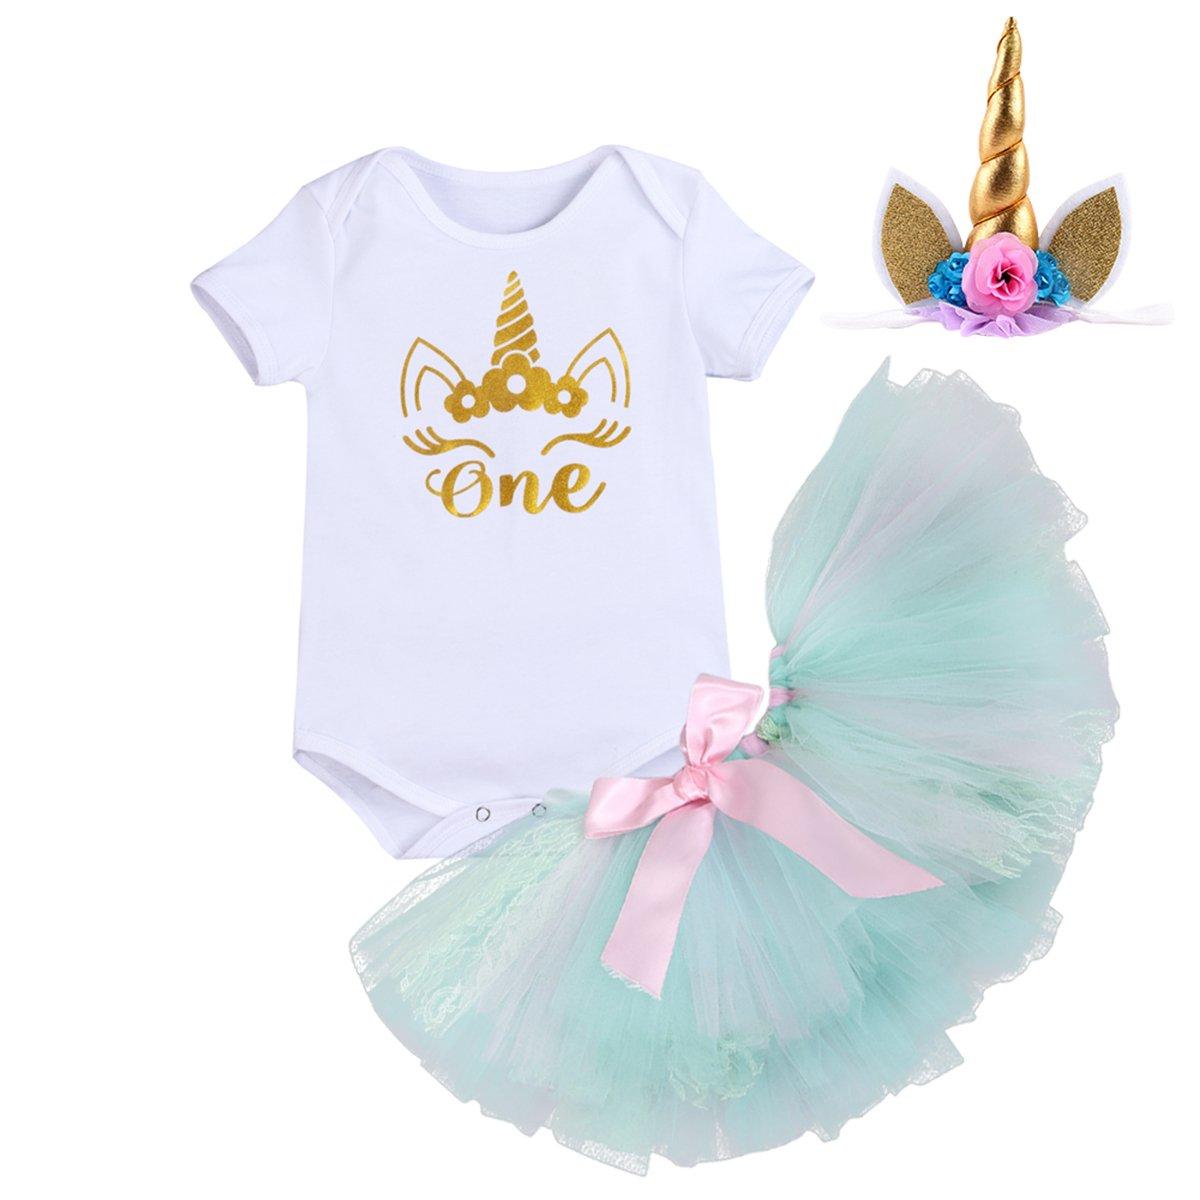 IBTOM CASTLE Baby Girl It's My 1st Birthday 3PCs Outfits Flower Princess Clothes Set